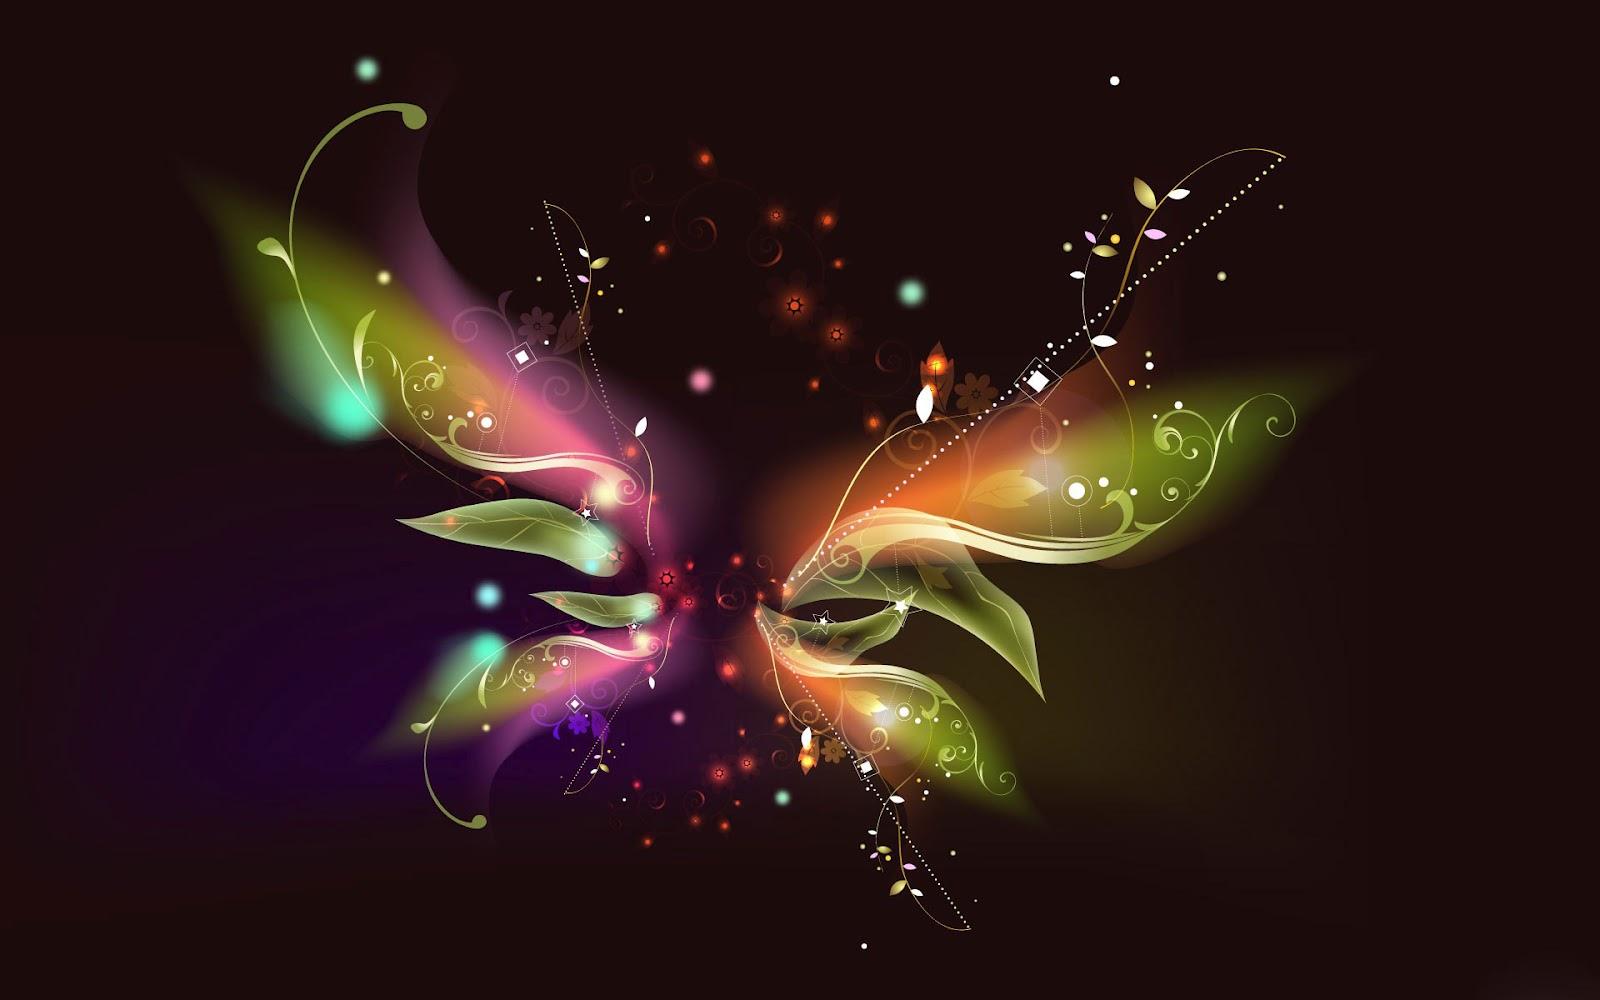 Neon Butterfly Desktop Background: Unique Wallpaper